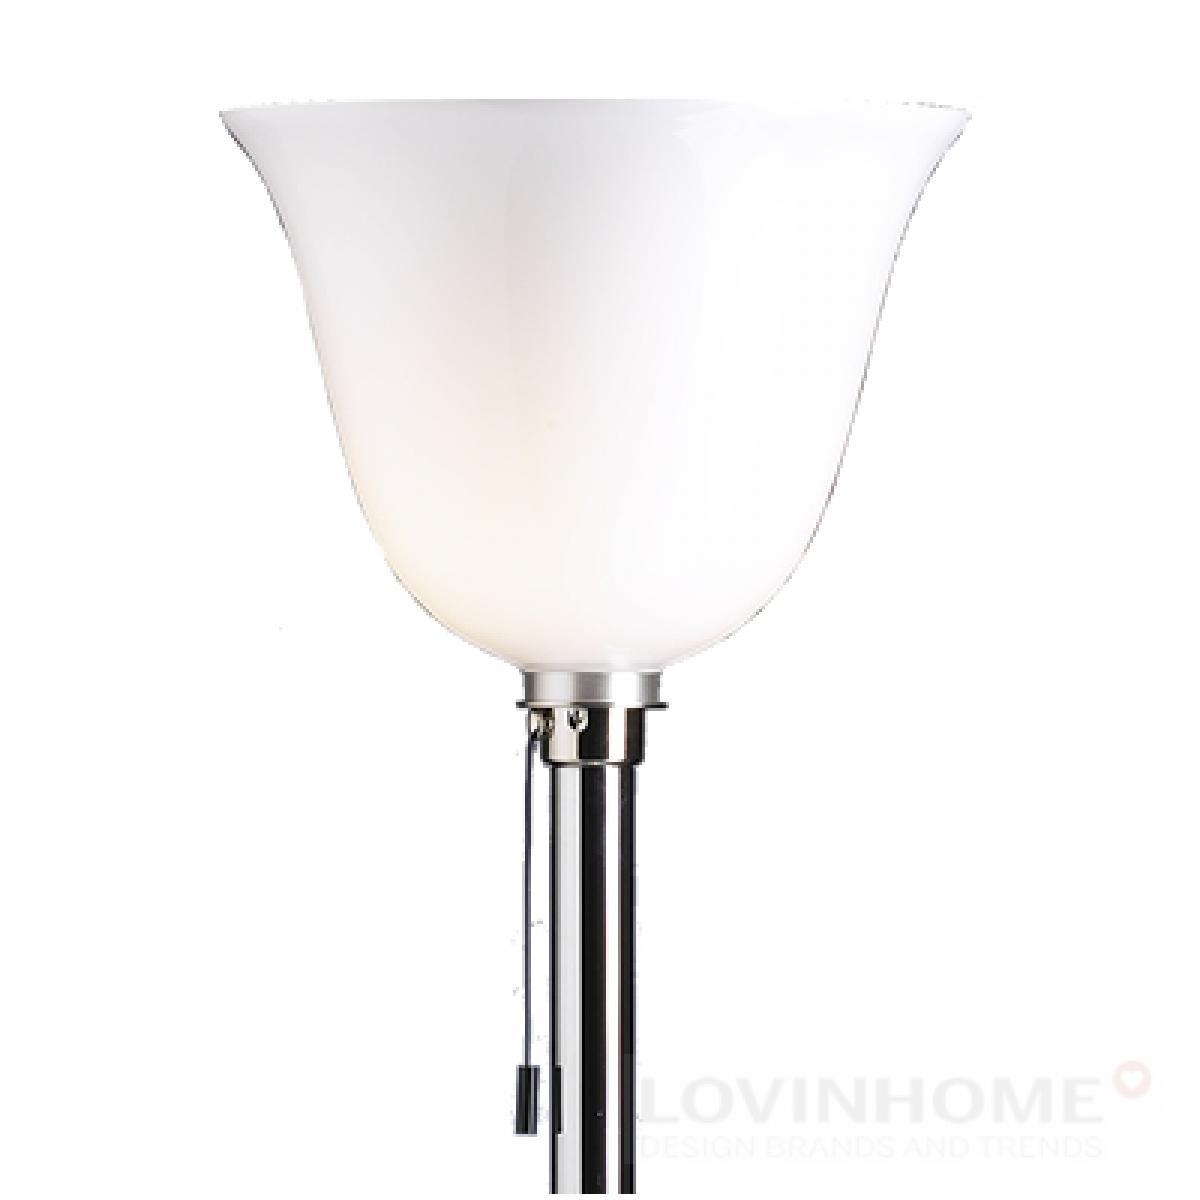 tecnolumen art deco lampe ad 30 ebay. Black Bedroom Furniture Sets. Home Design Ideas